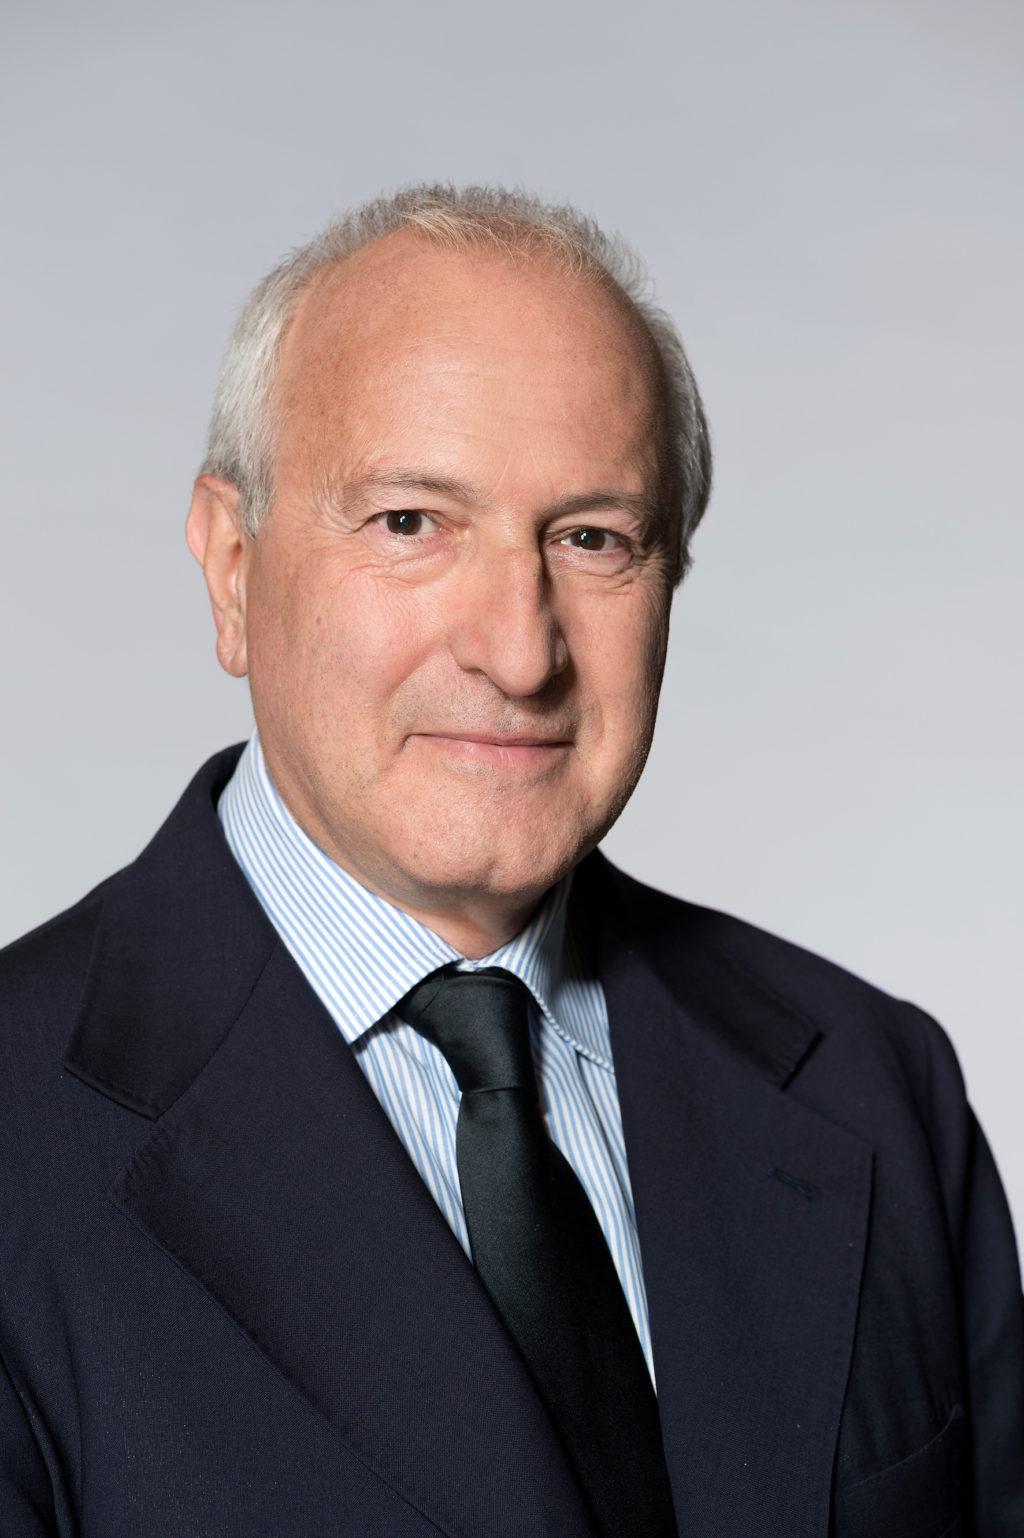 Gianfranco Noferi